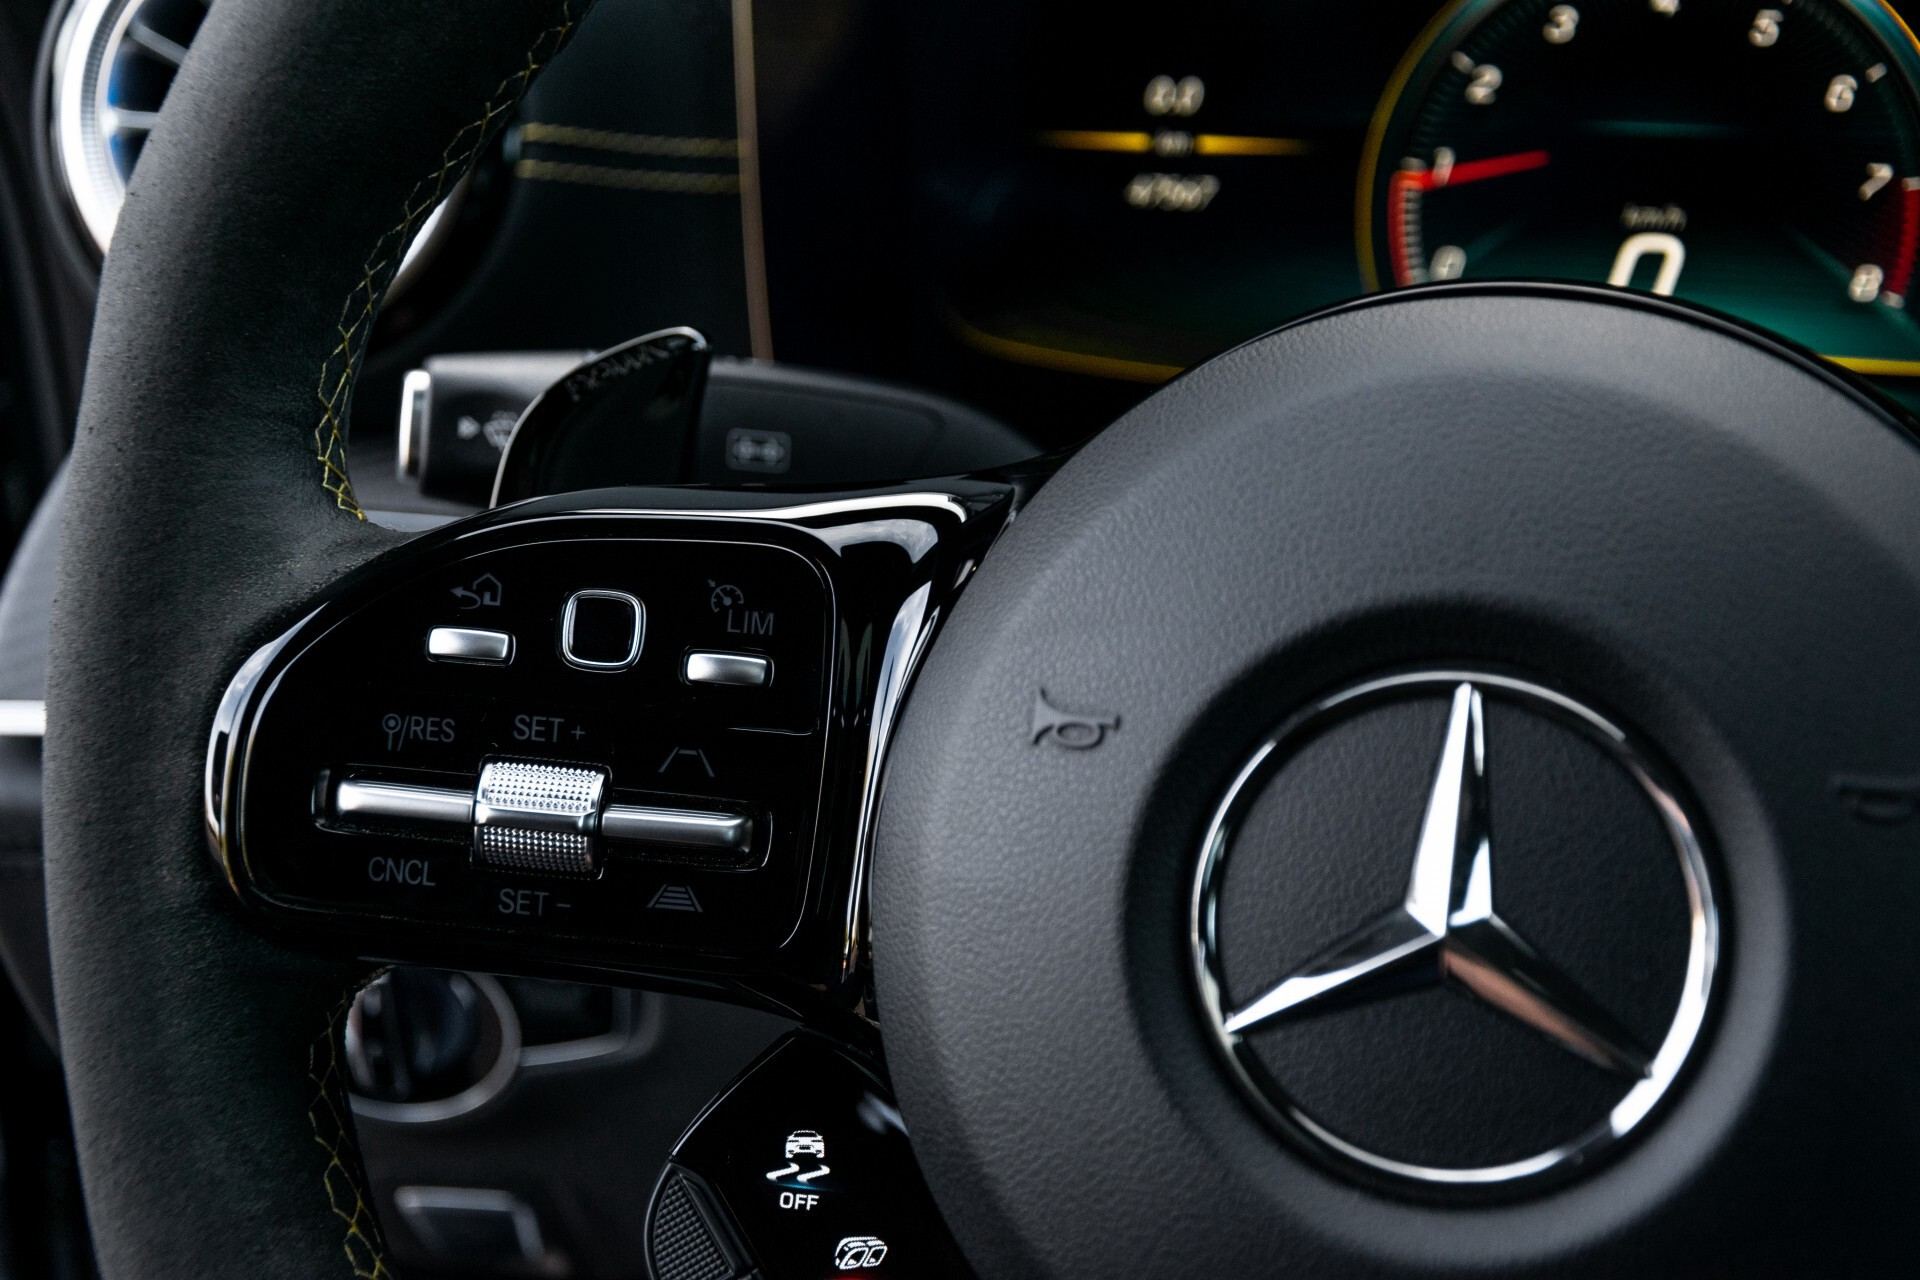 Mercedes-Benz AMG GT 4-Door Coupe 63 S 4MATIC+ Edition 1 Keramisch/Carbon/First Class/Dynamic Plus/Burmester High End 3D Aut9 Foto 10